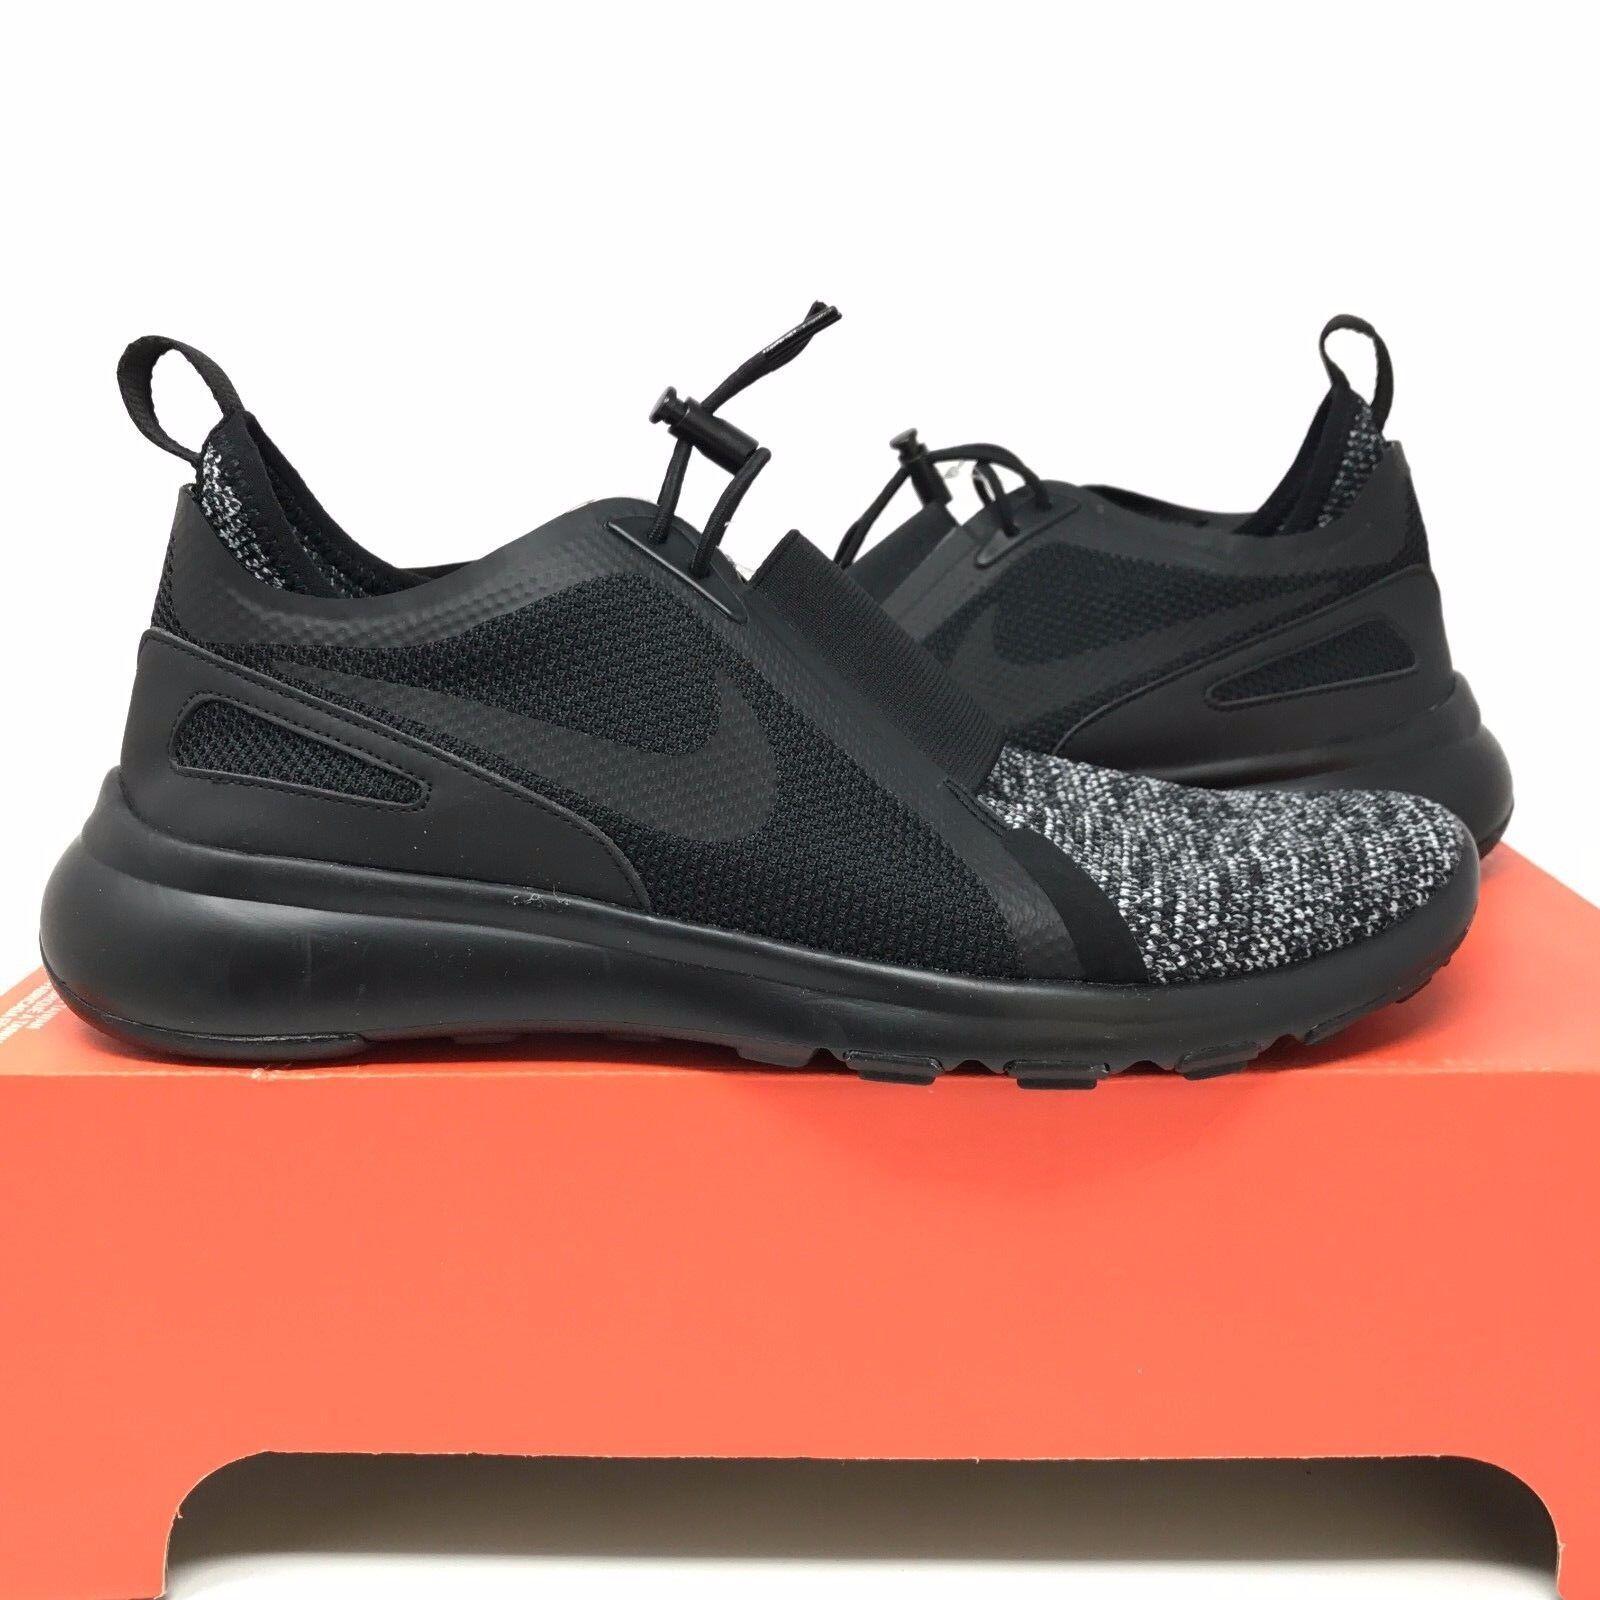 Nike Current Slip On BR Black 903895-001 - Breathe Dart Presto Flyknit Tech Sock